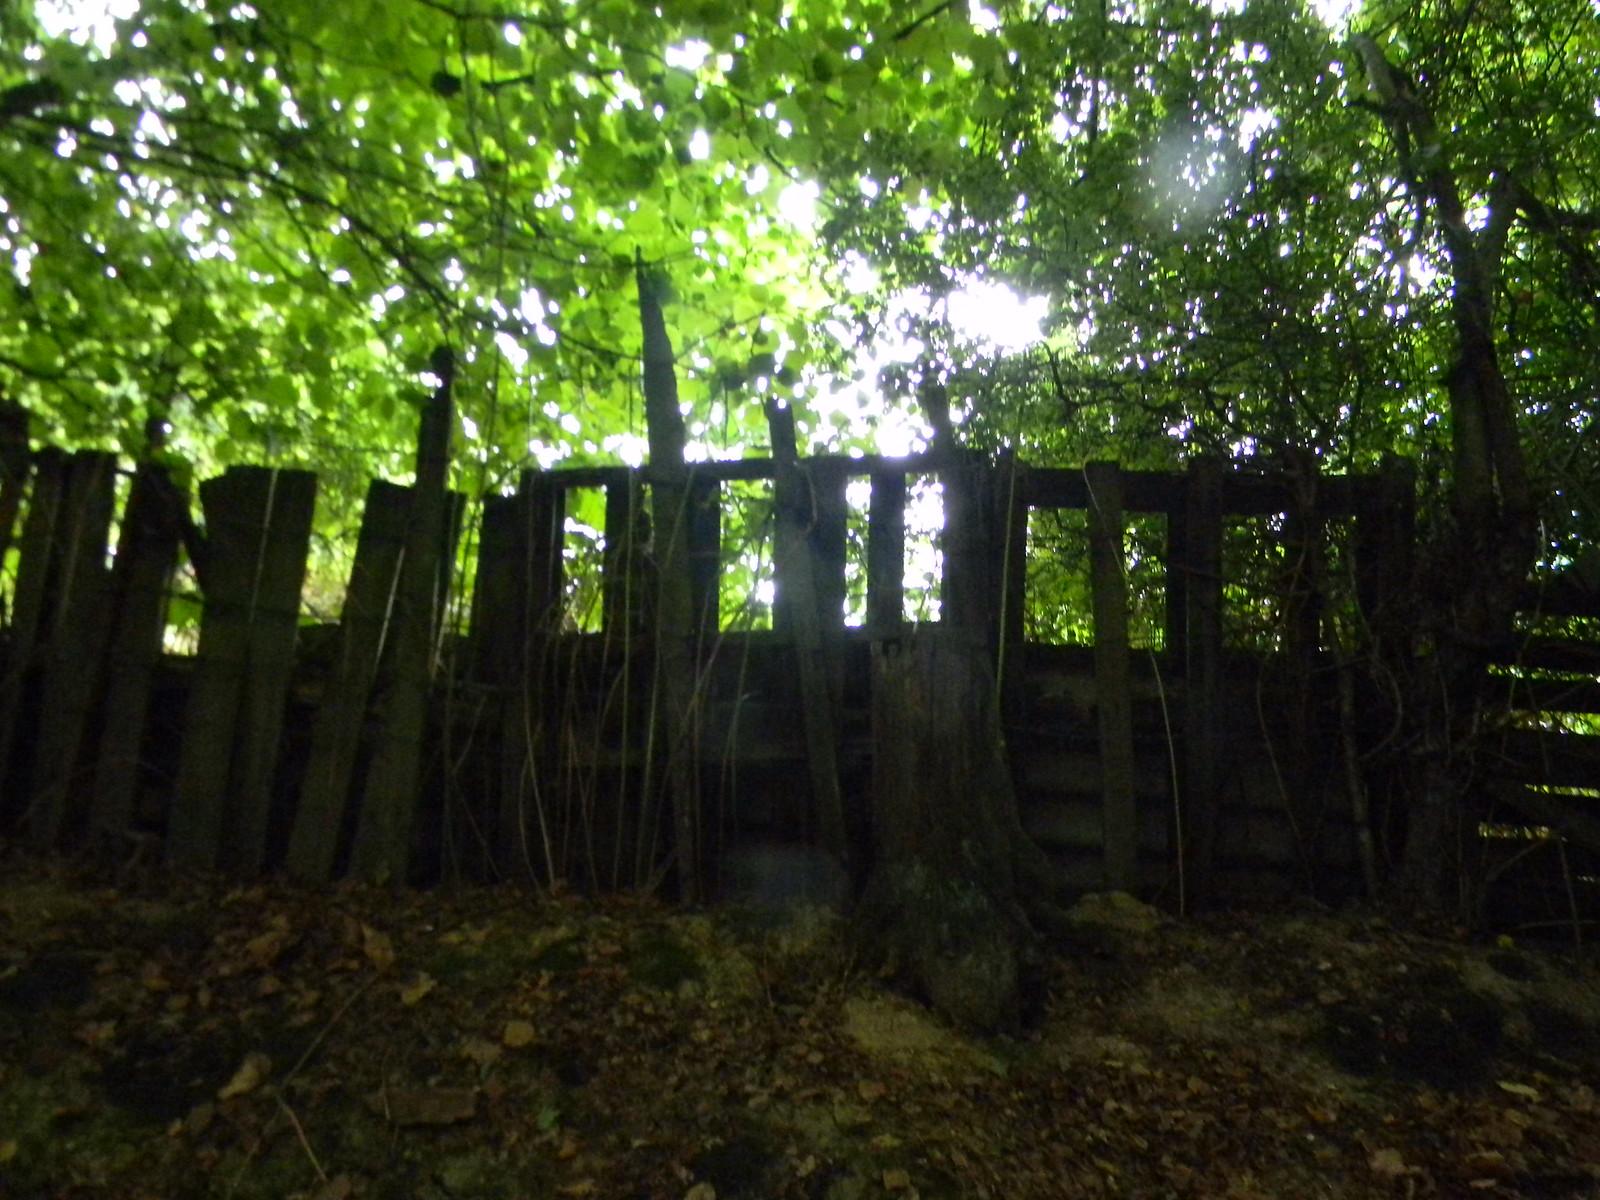 Ramshackle fence 3 Wadhurst Circular